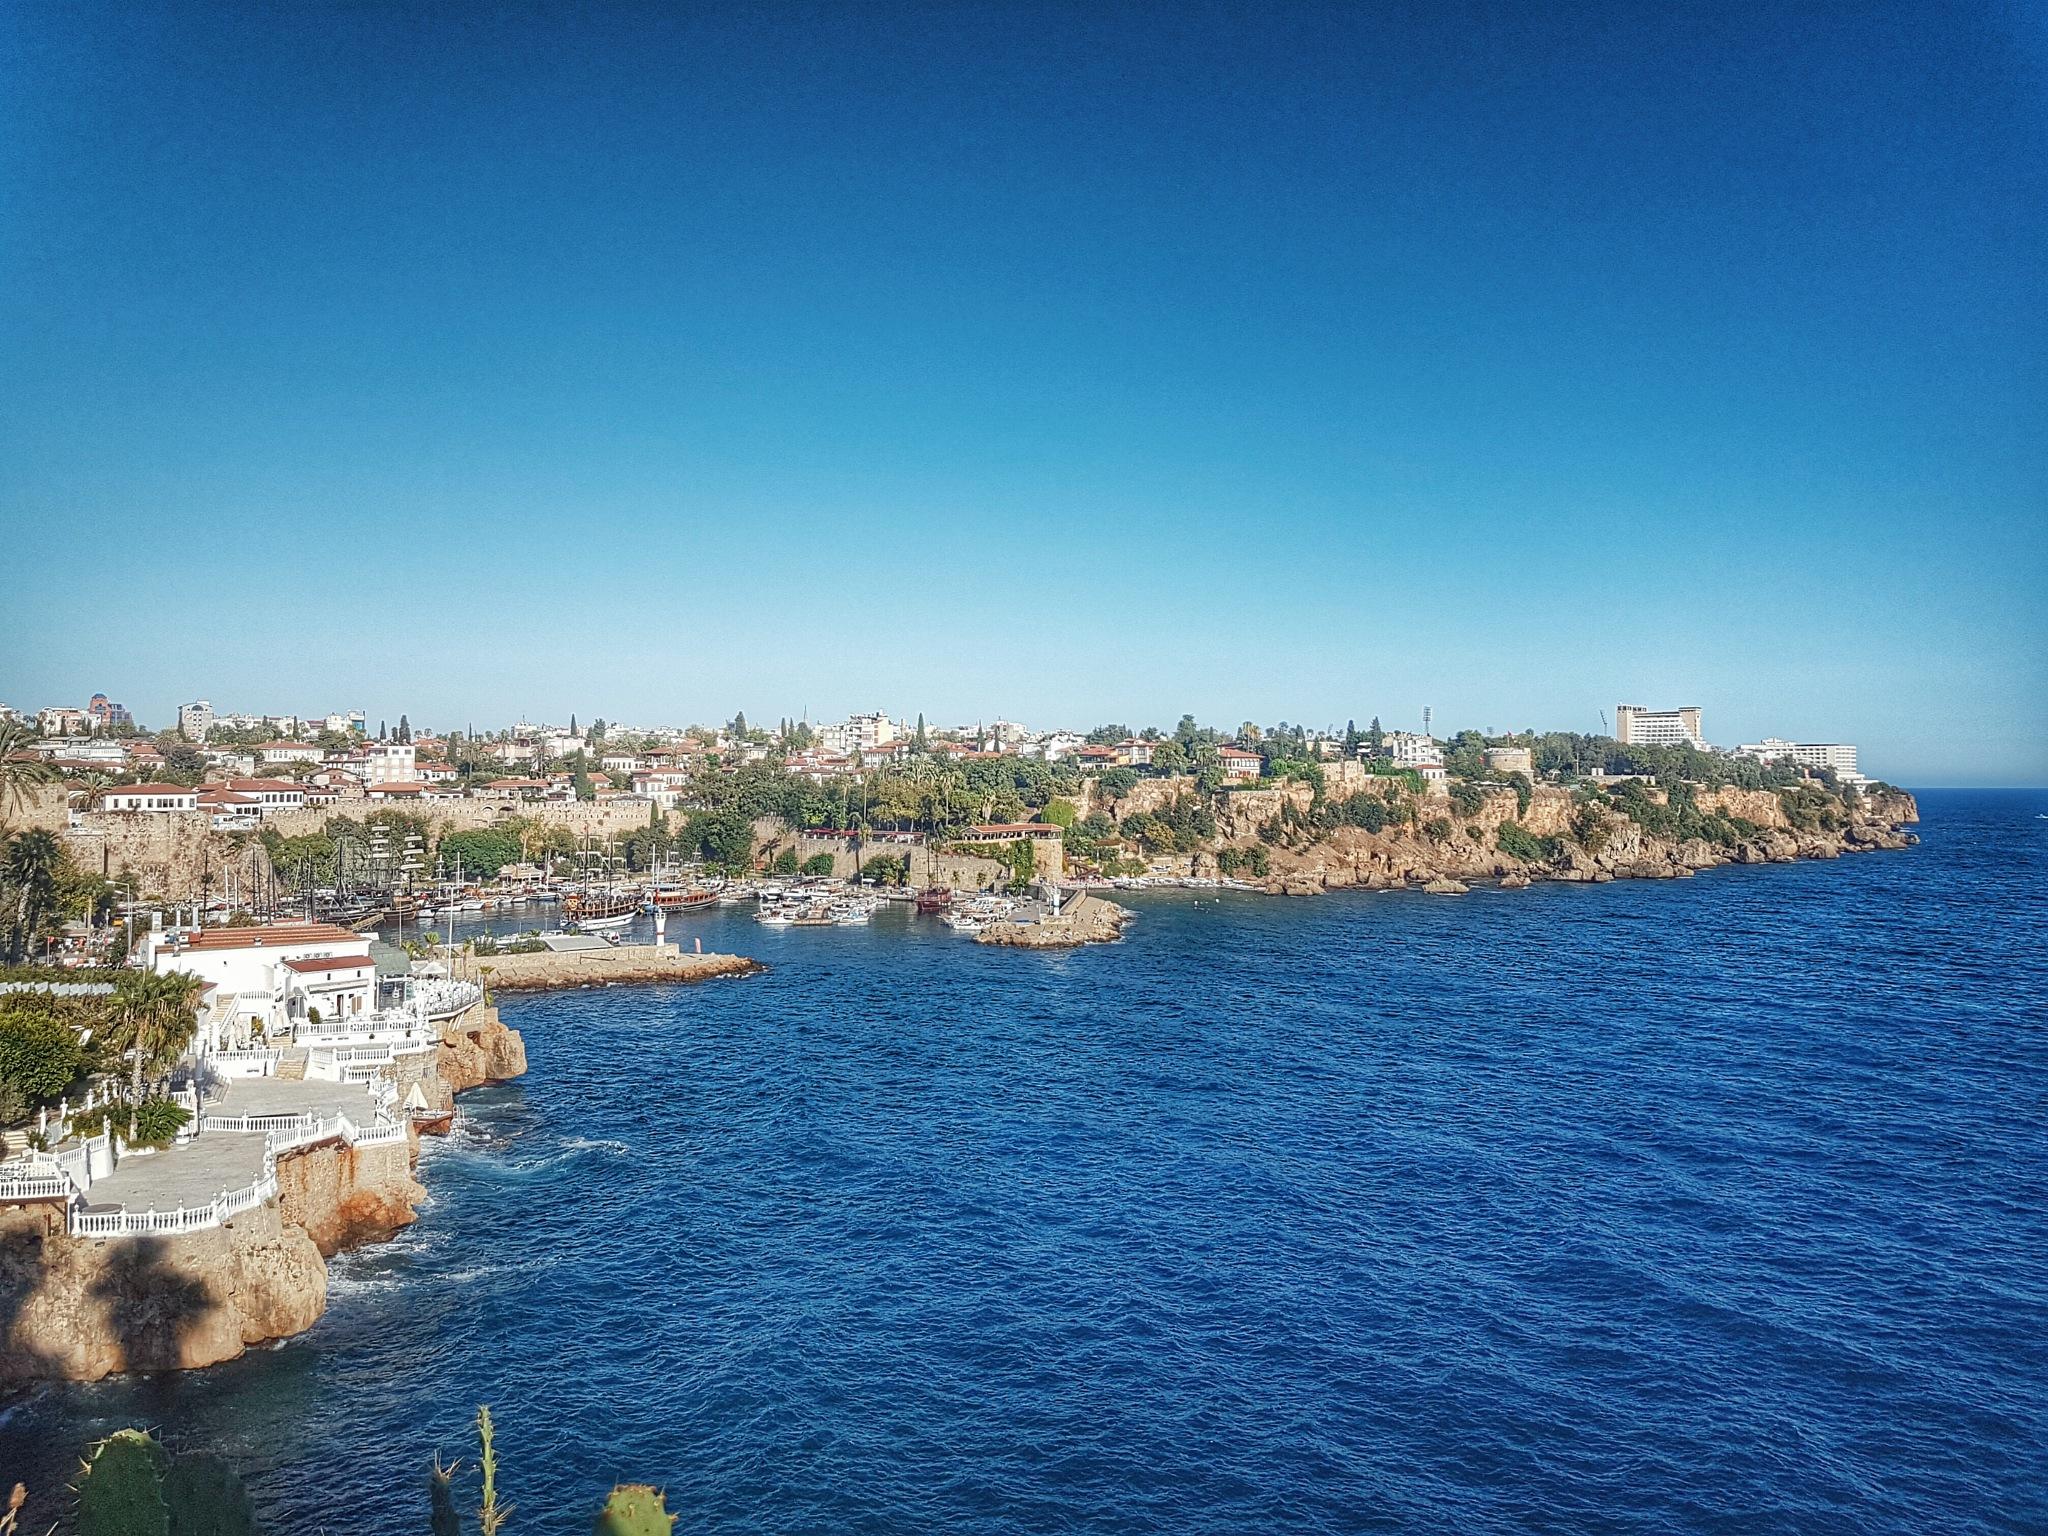 Sea City by efc07